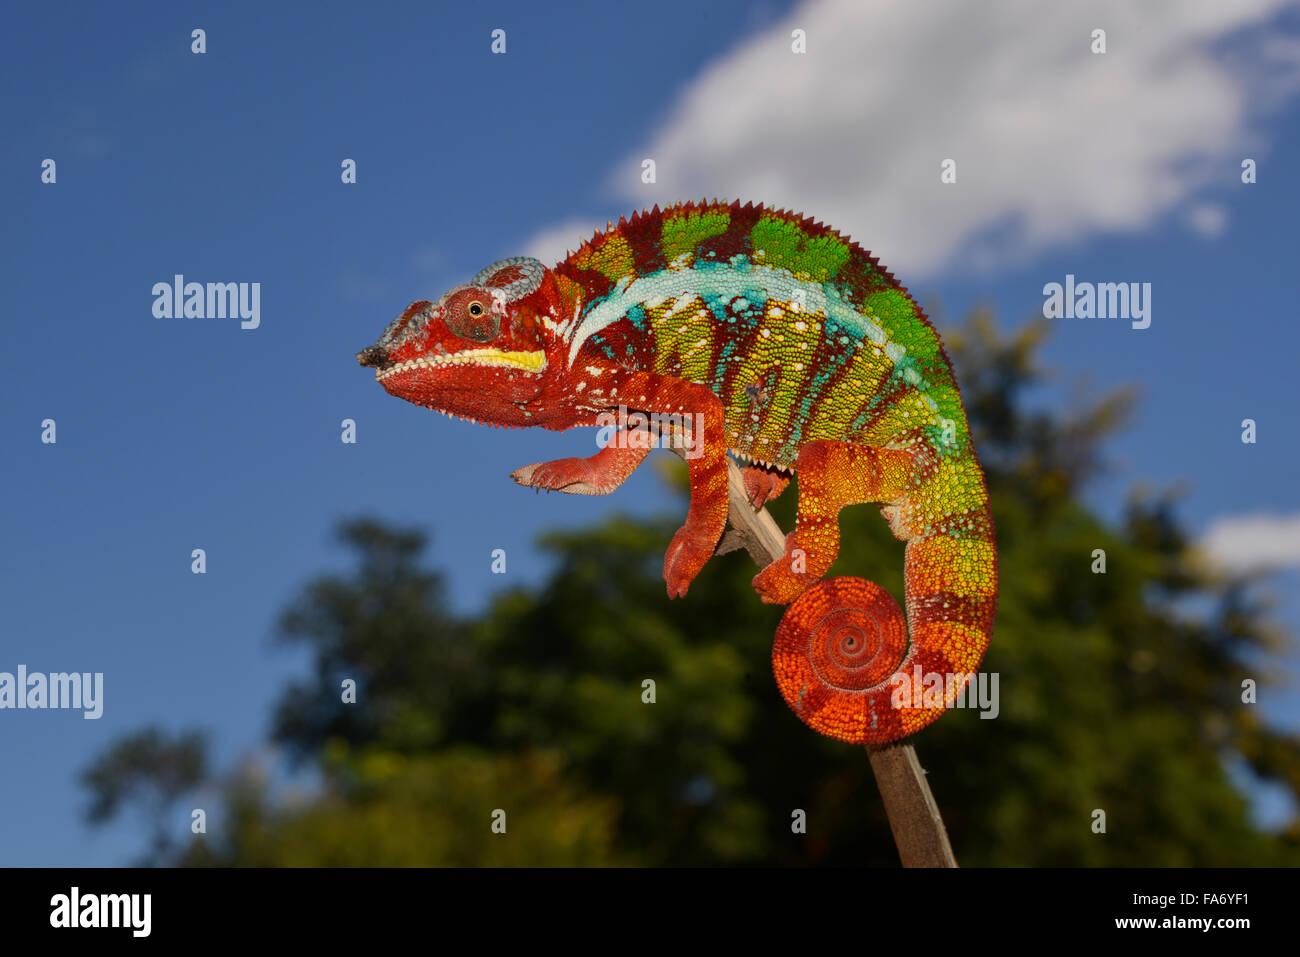 Panther chameleon (Furcifer pardalis), local form Ambanja, West Madagascar - Stock Image